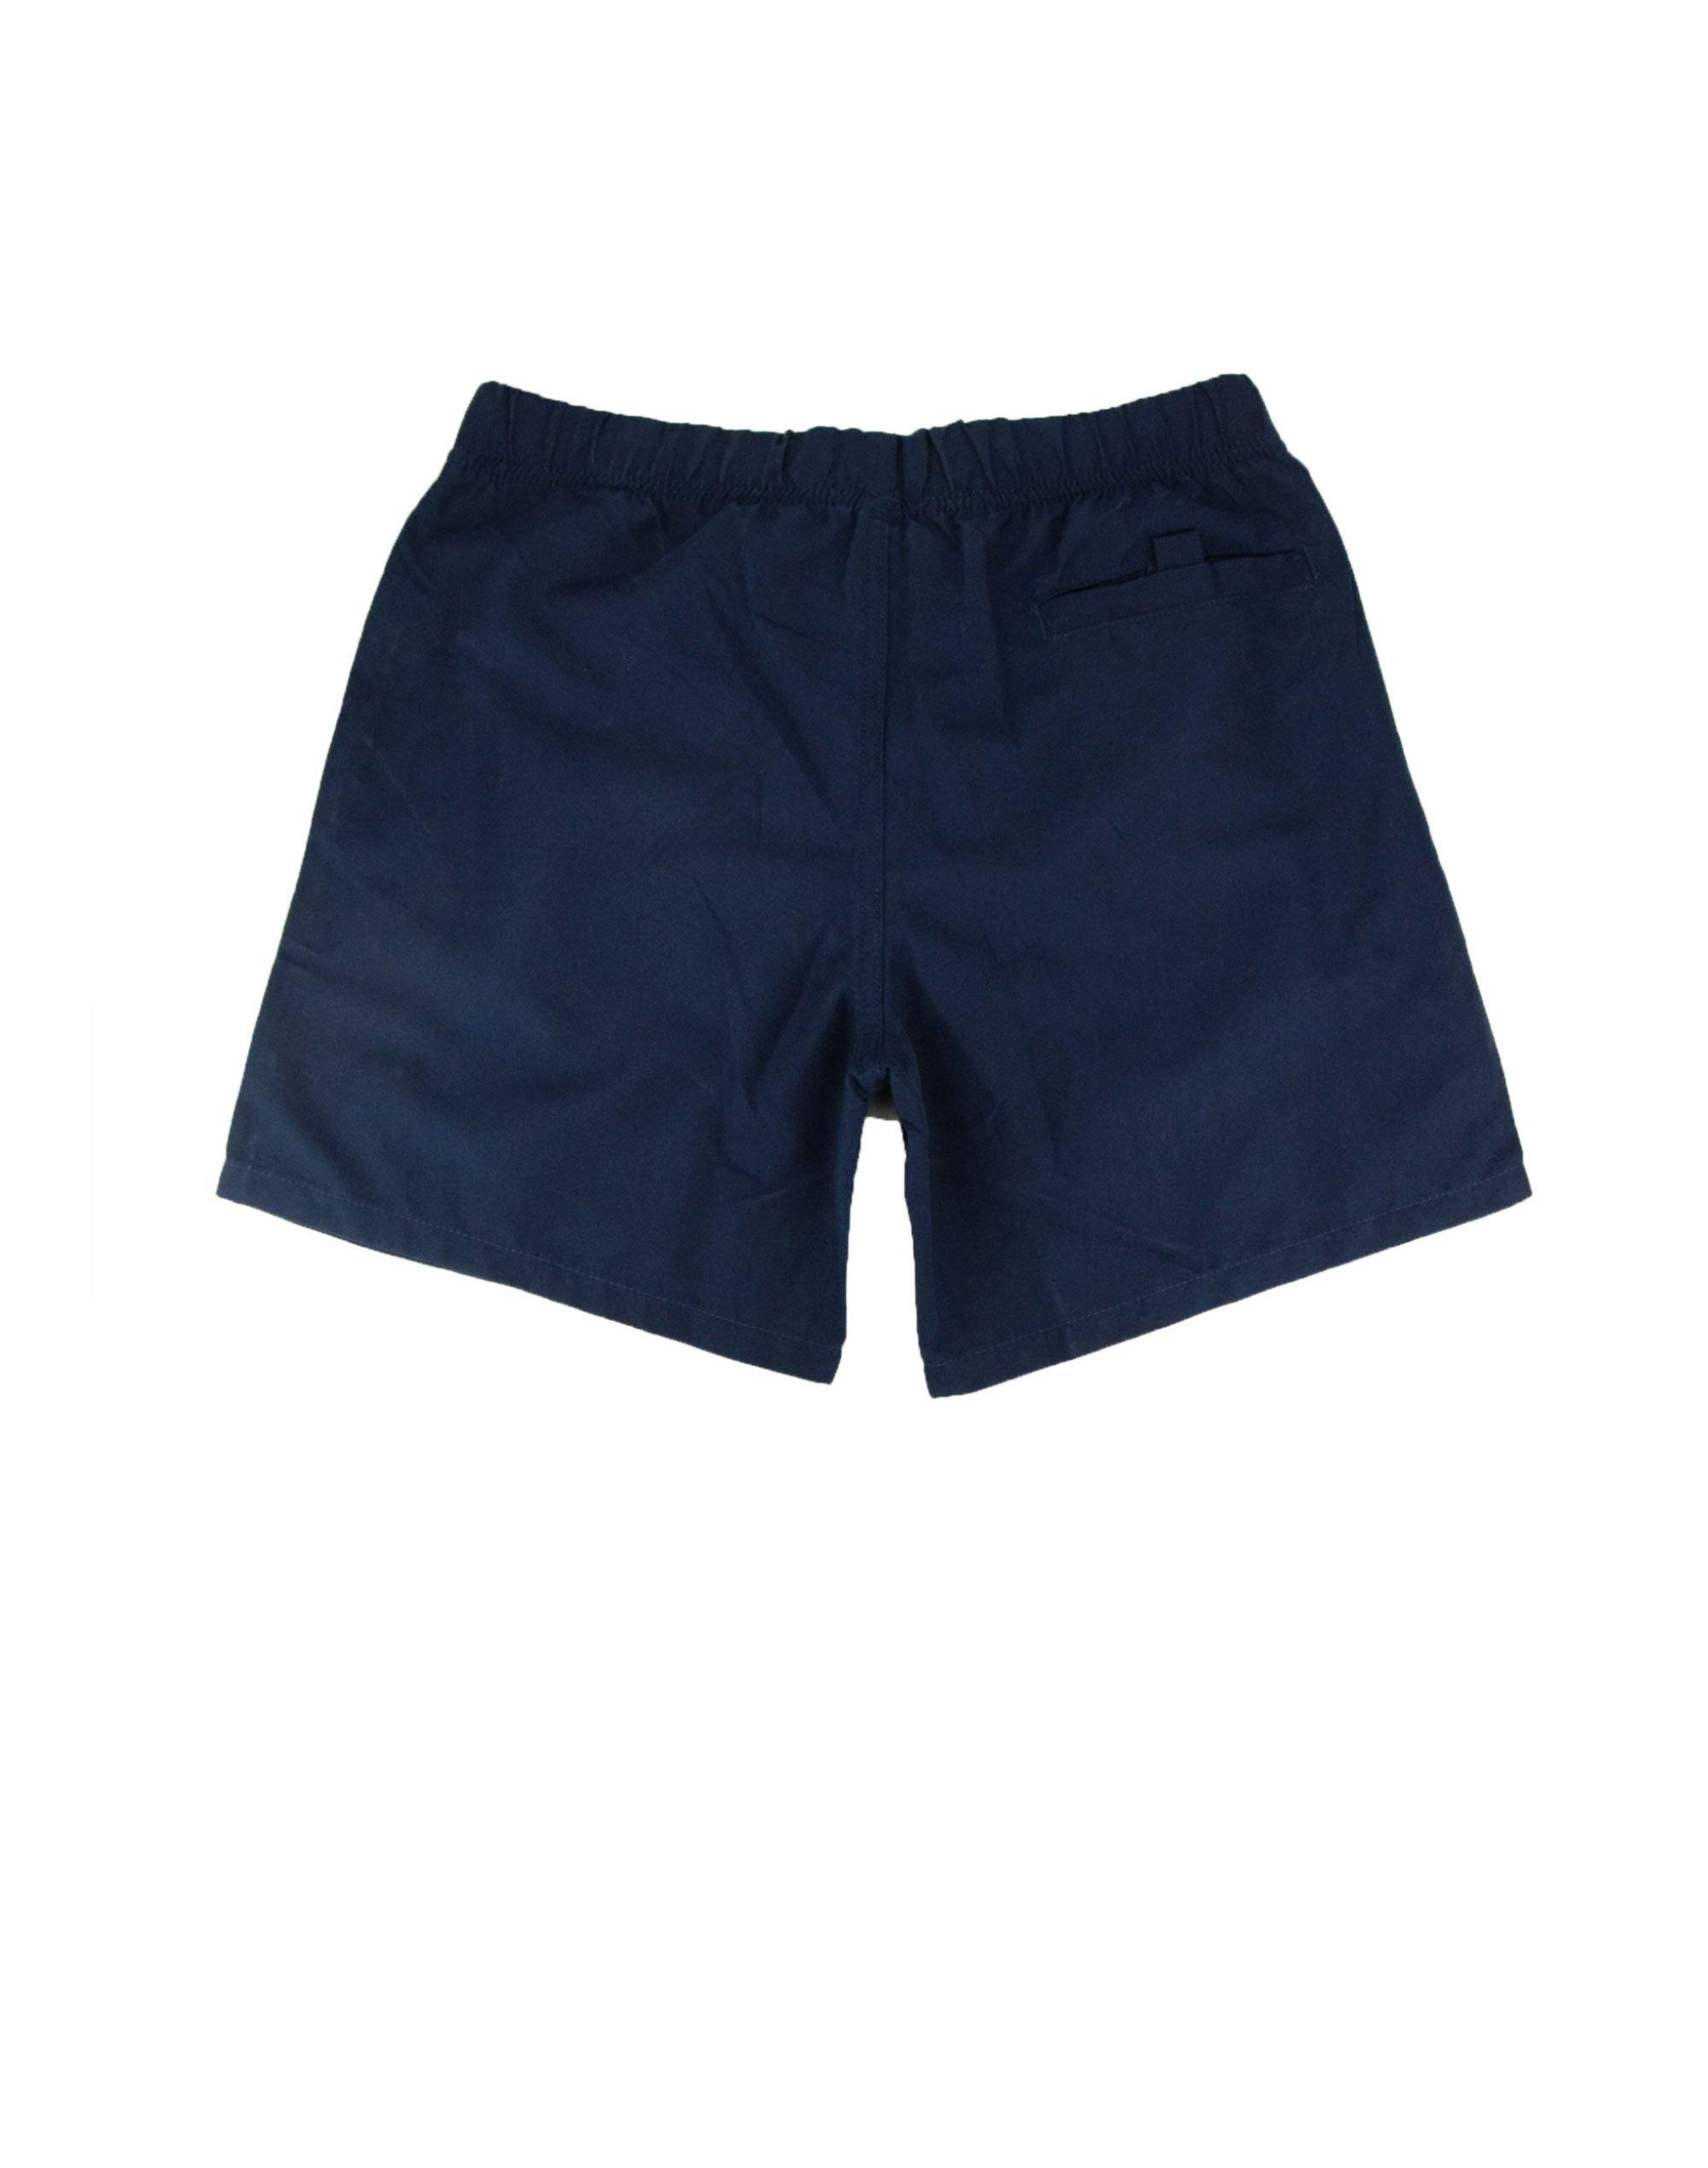 Shiwi Swimwear (4100111000) Dark Navy